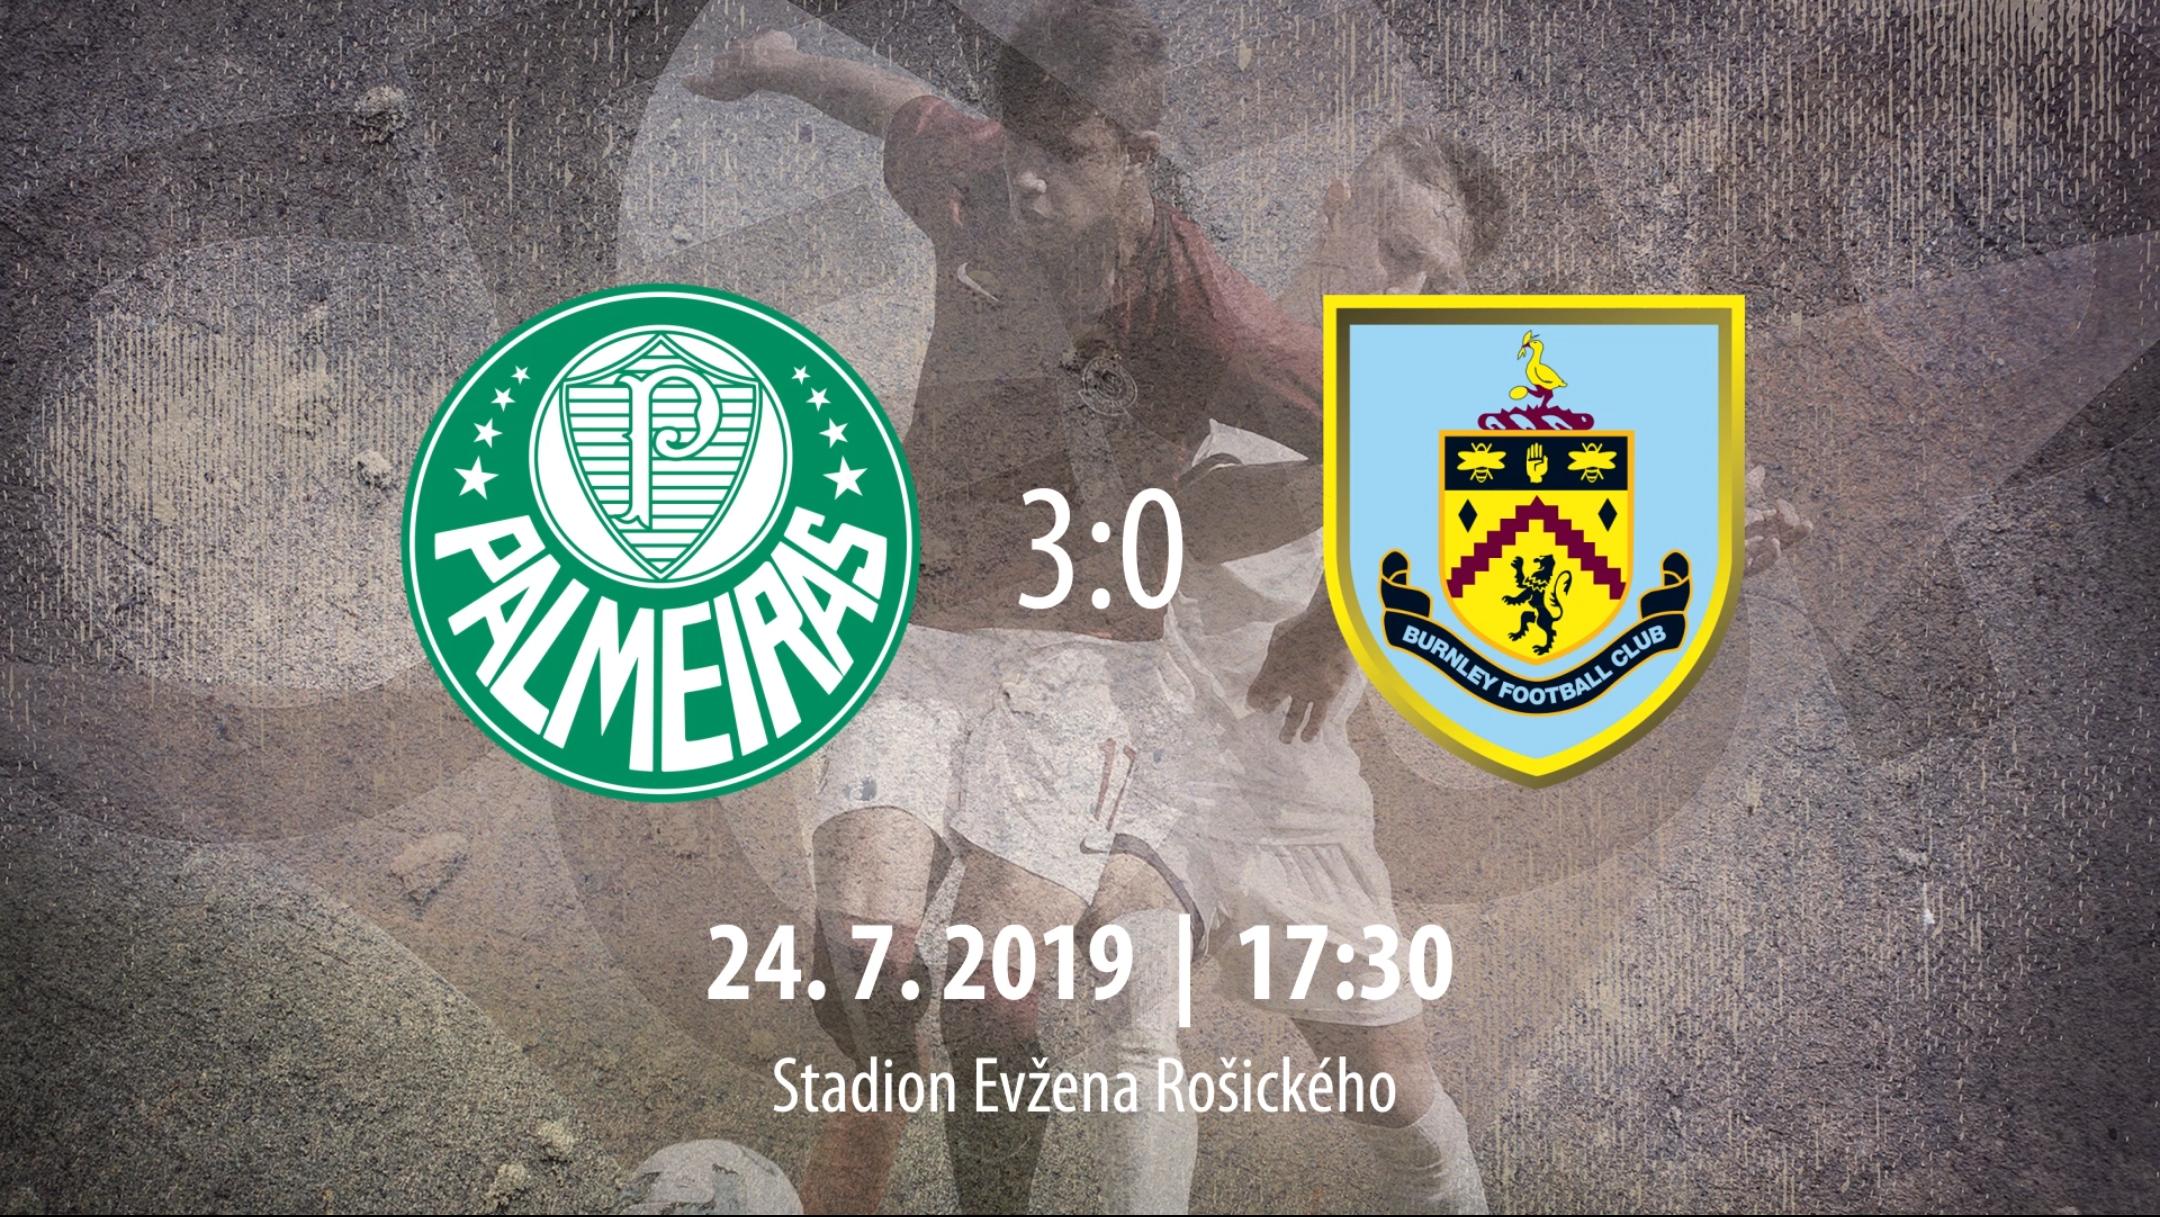 [HIGHLIGHTS] CEE Cup 2019: SE Palmeiras vs Burnley FC 3-0